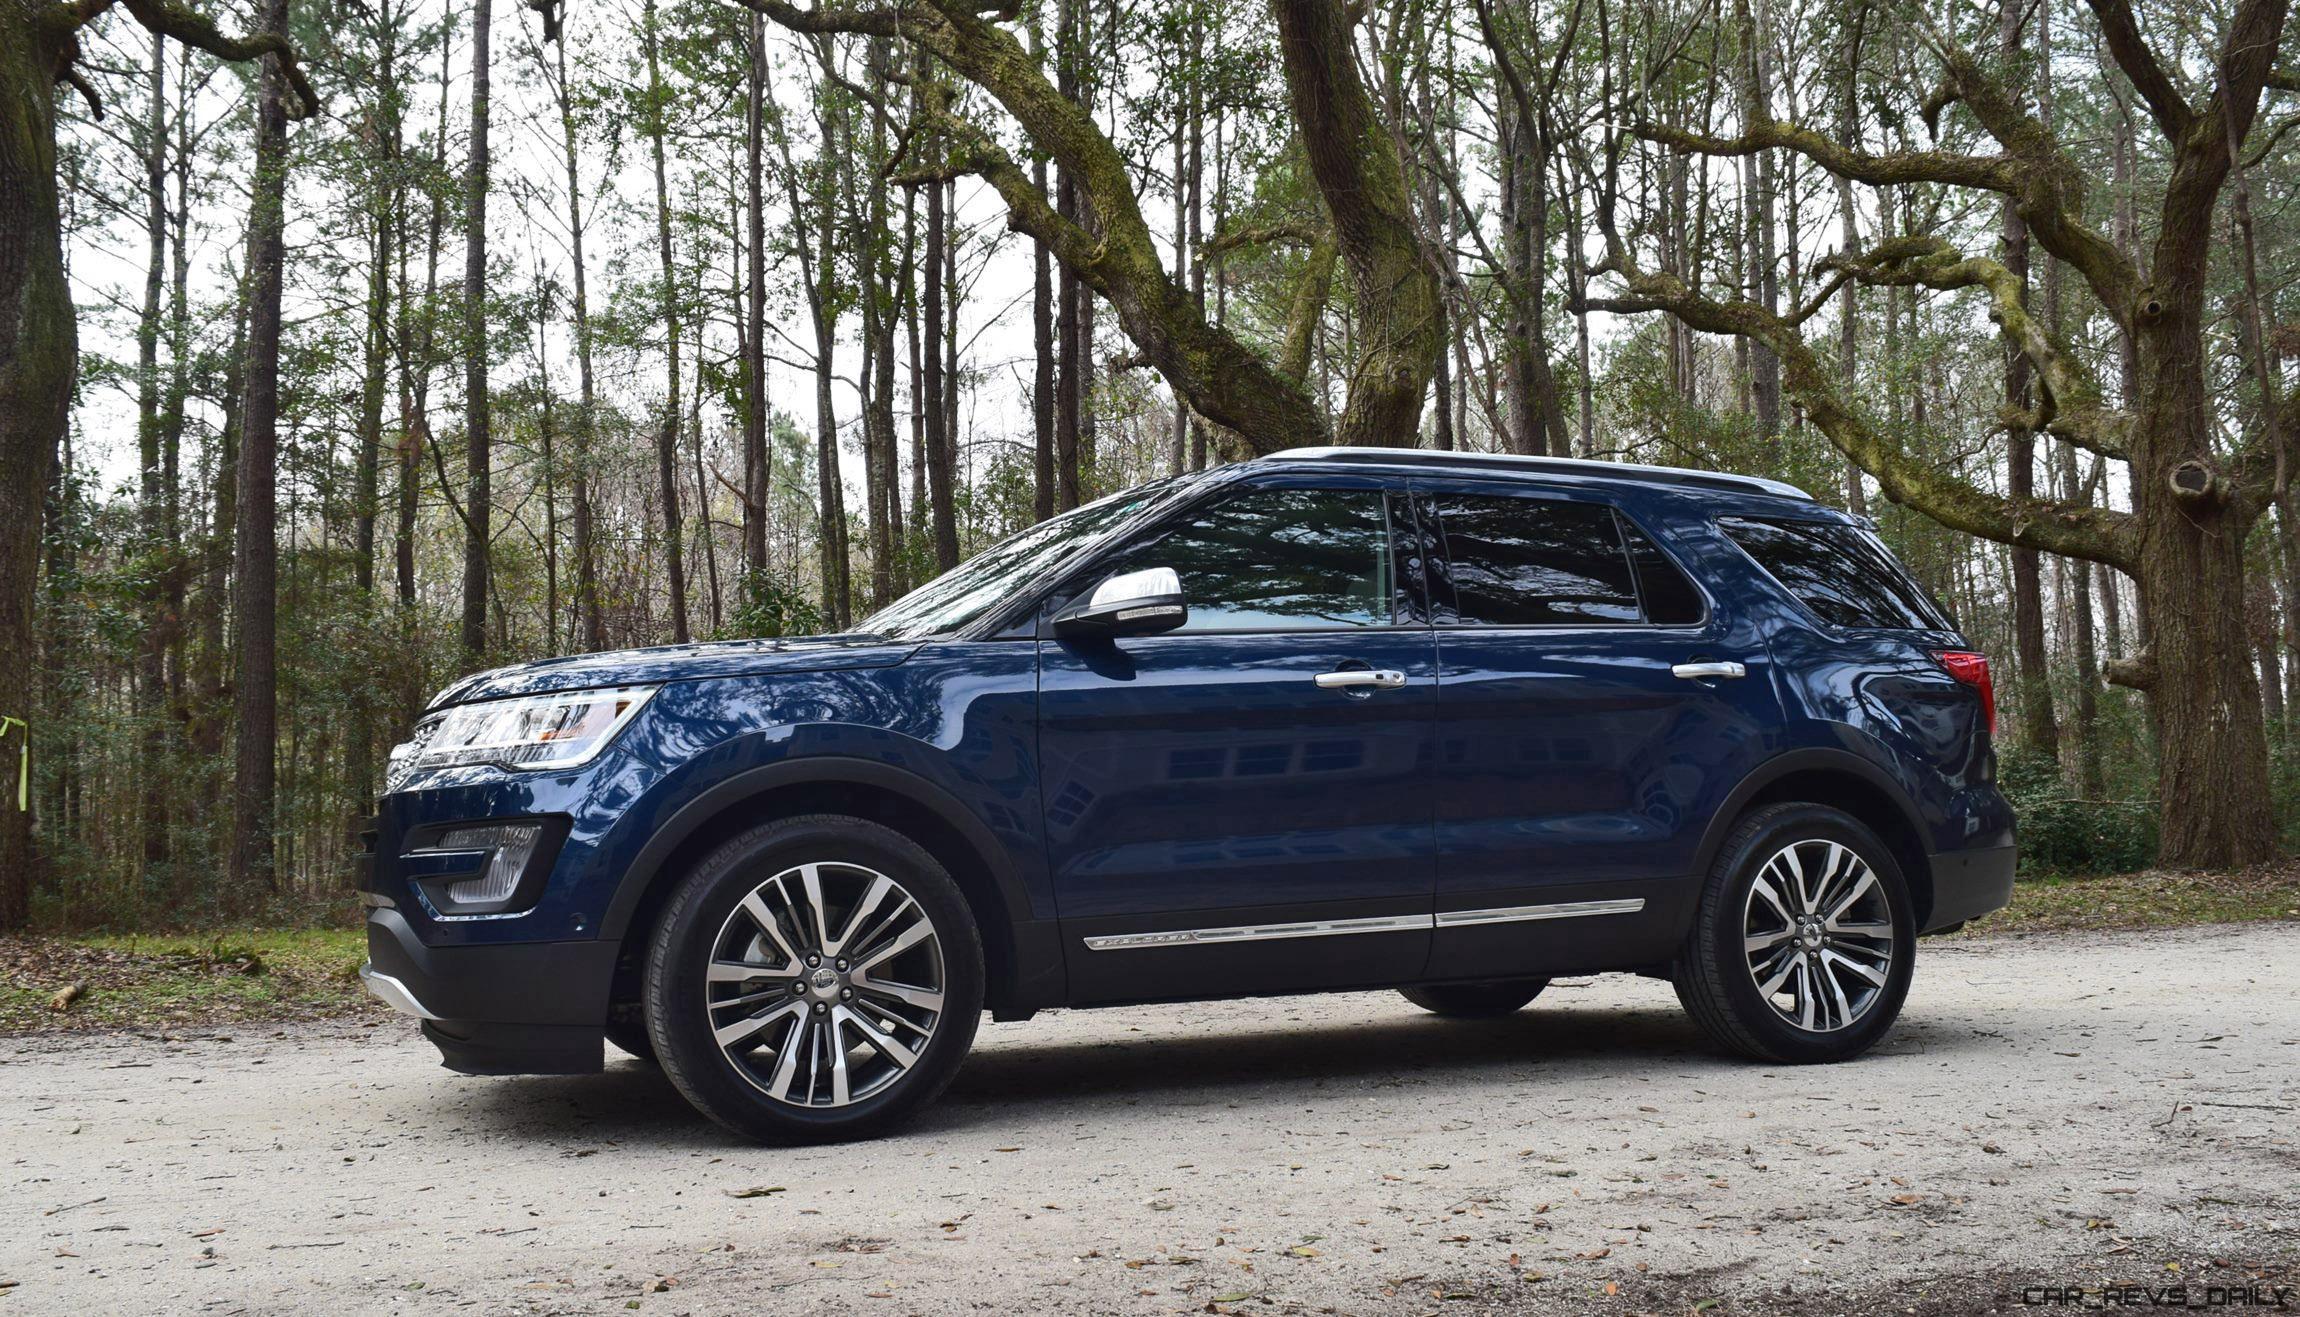 Colors Ford Platinum 2017 Explorer